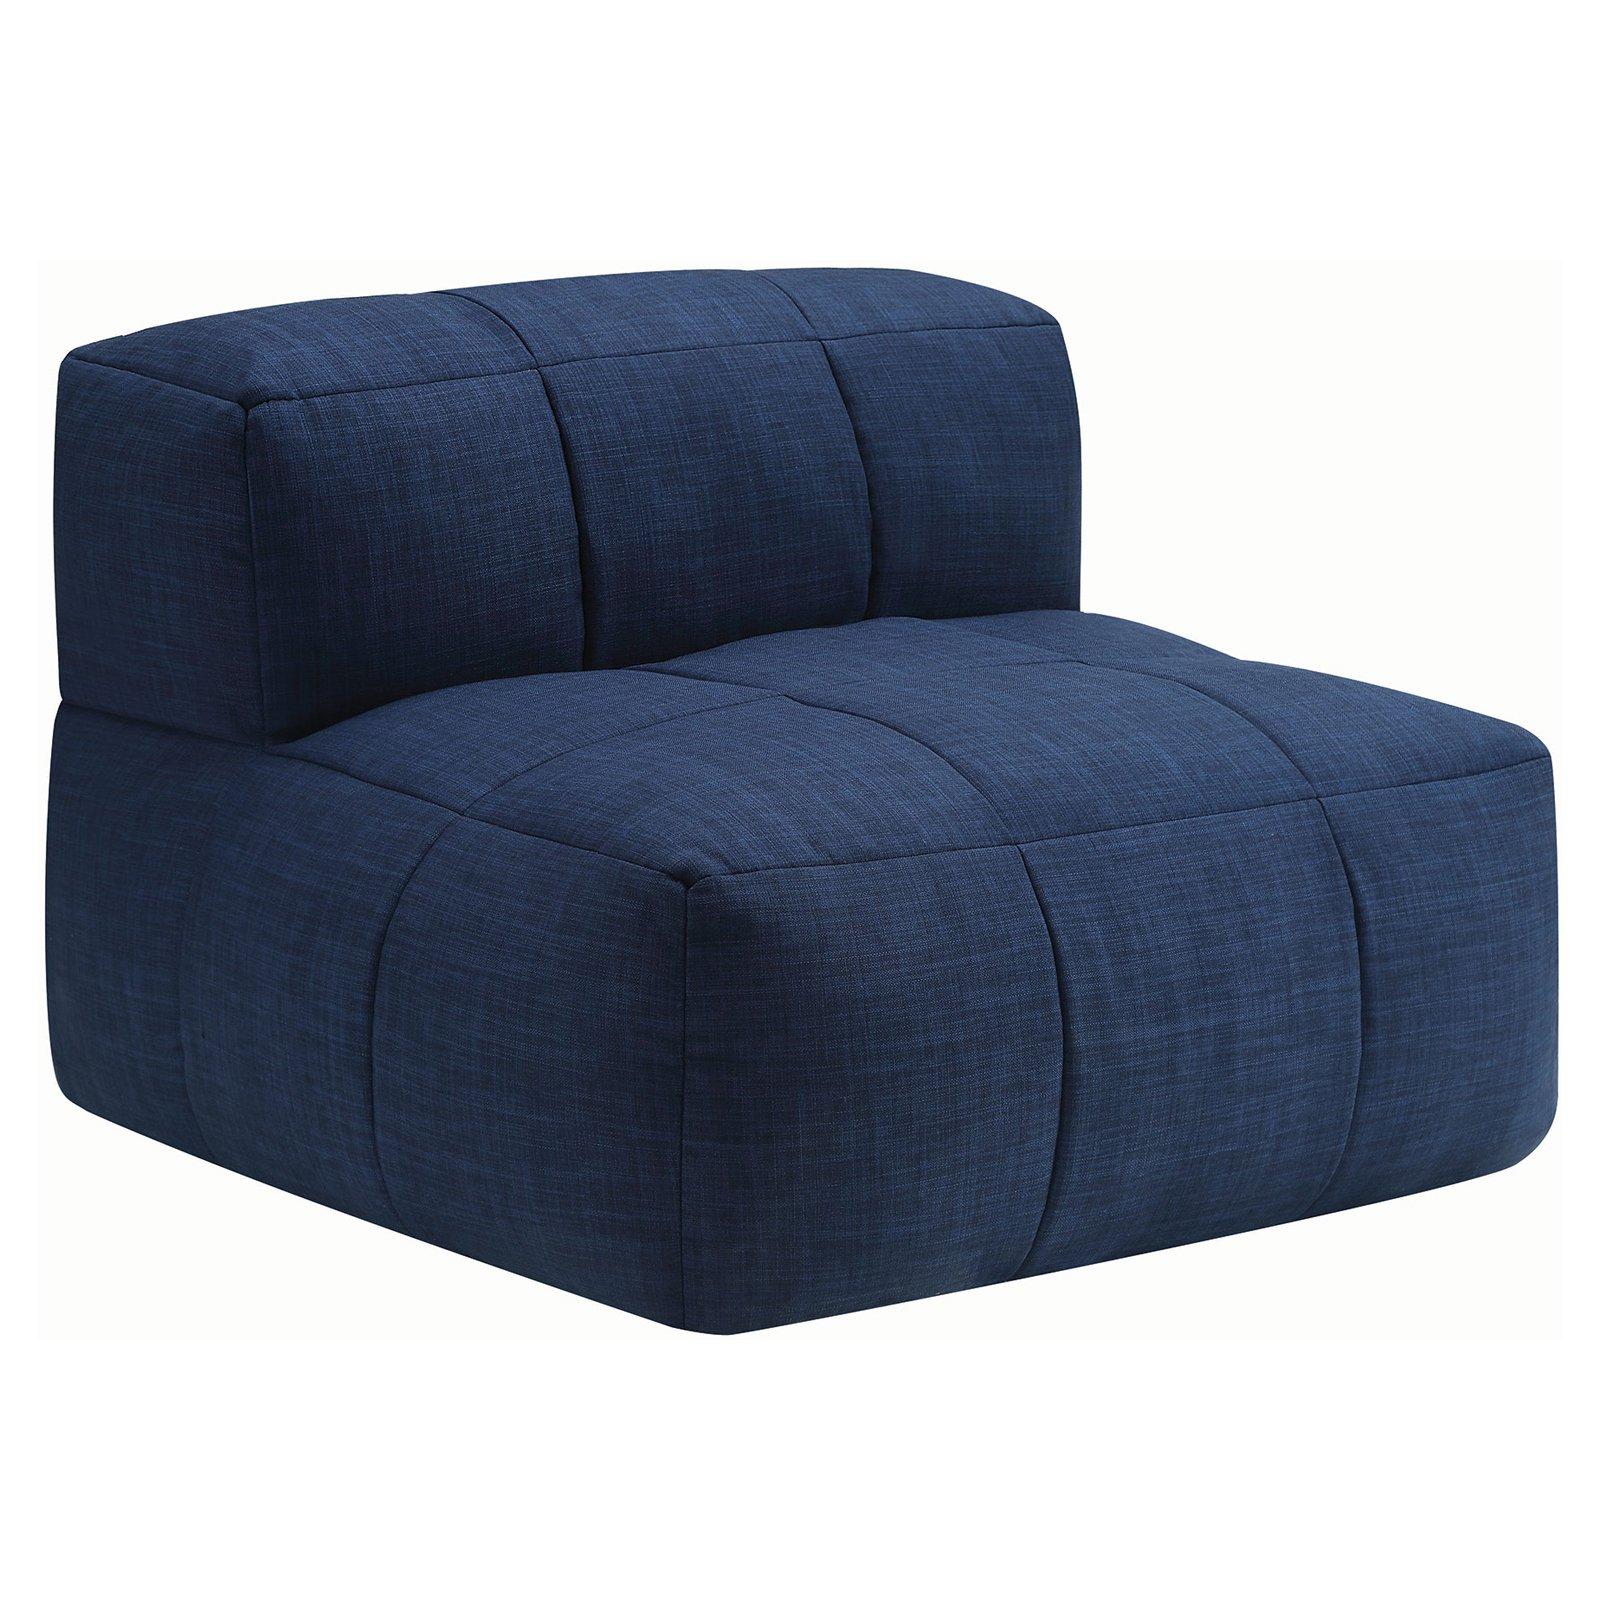 Pleasant Coaster Furniture Huntington Accent Chair Machost Co Dining Chair Design Ideas Machostcouk